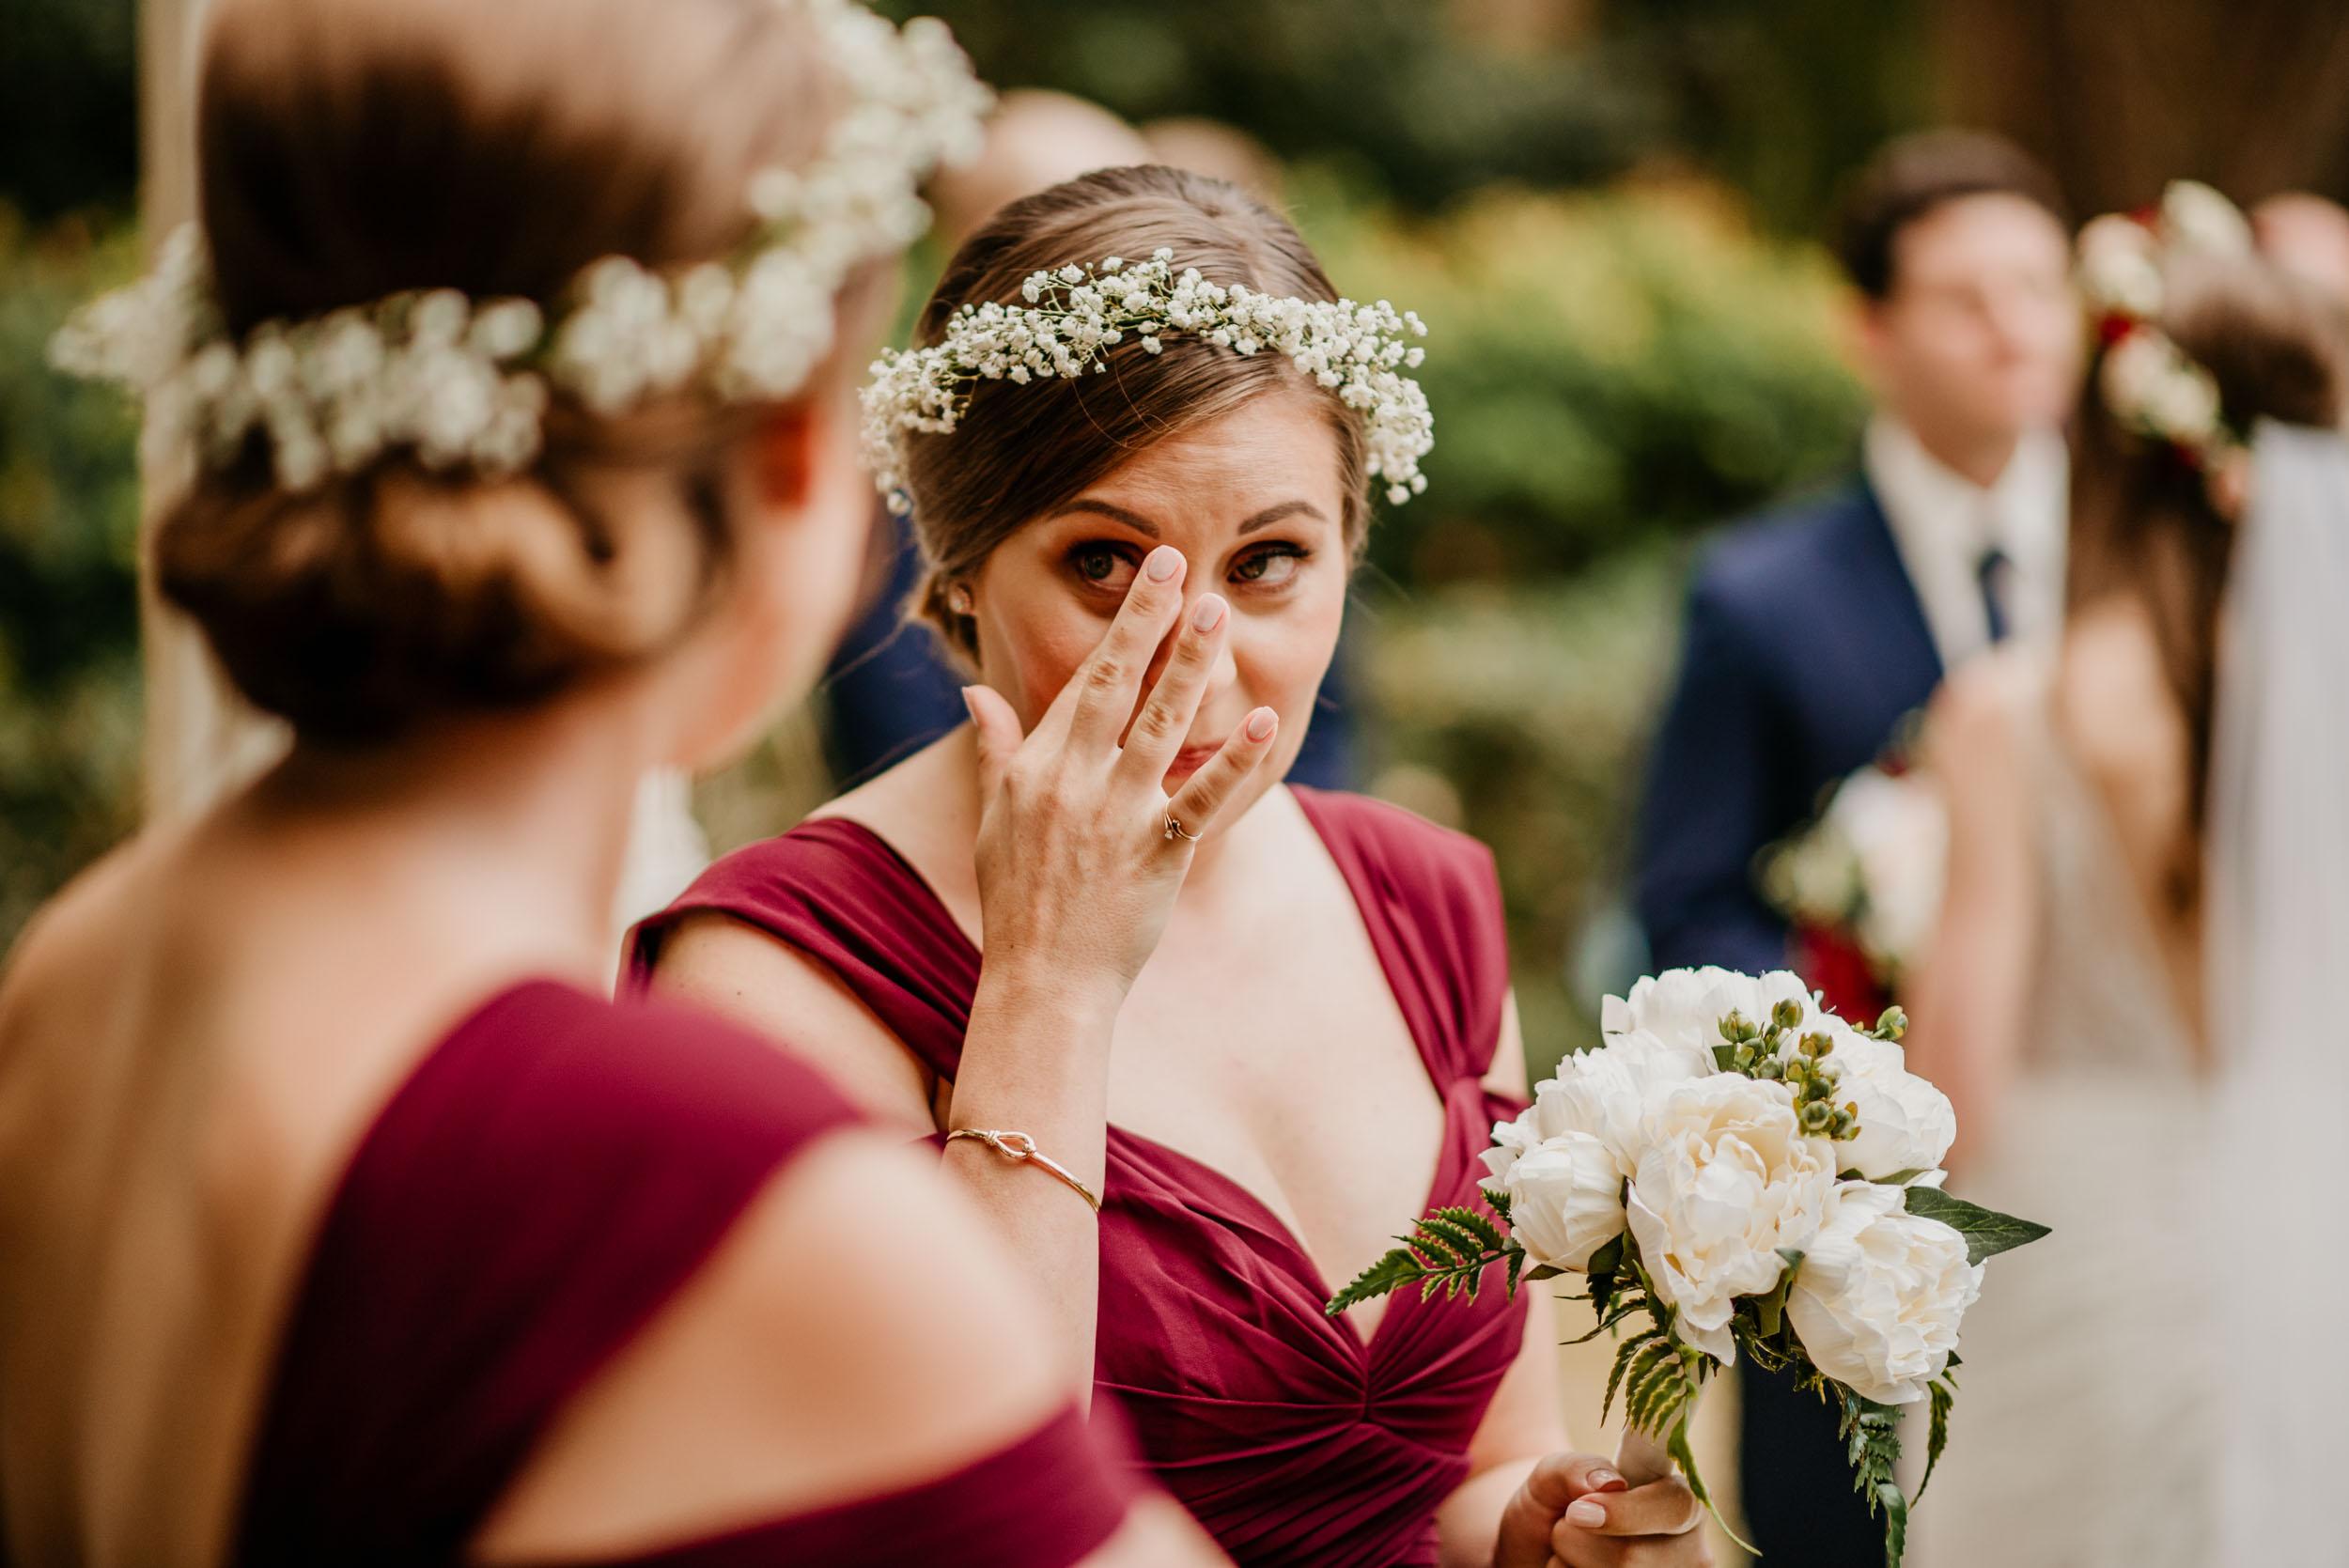 The Raw Photographer - Cairns Wedding Photographer - Laloli - Cairns Garden Ceremony - Cane Fields Photo Shoot-36.jpg